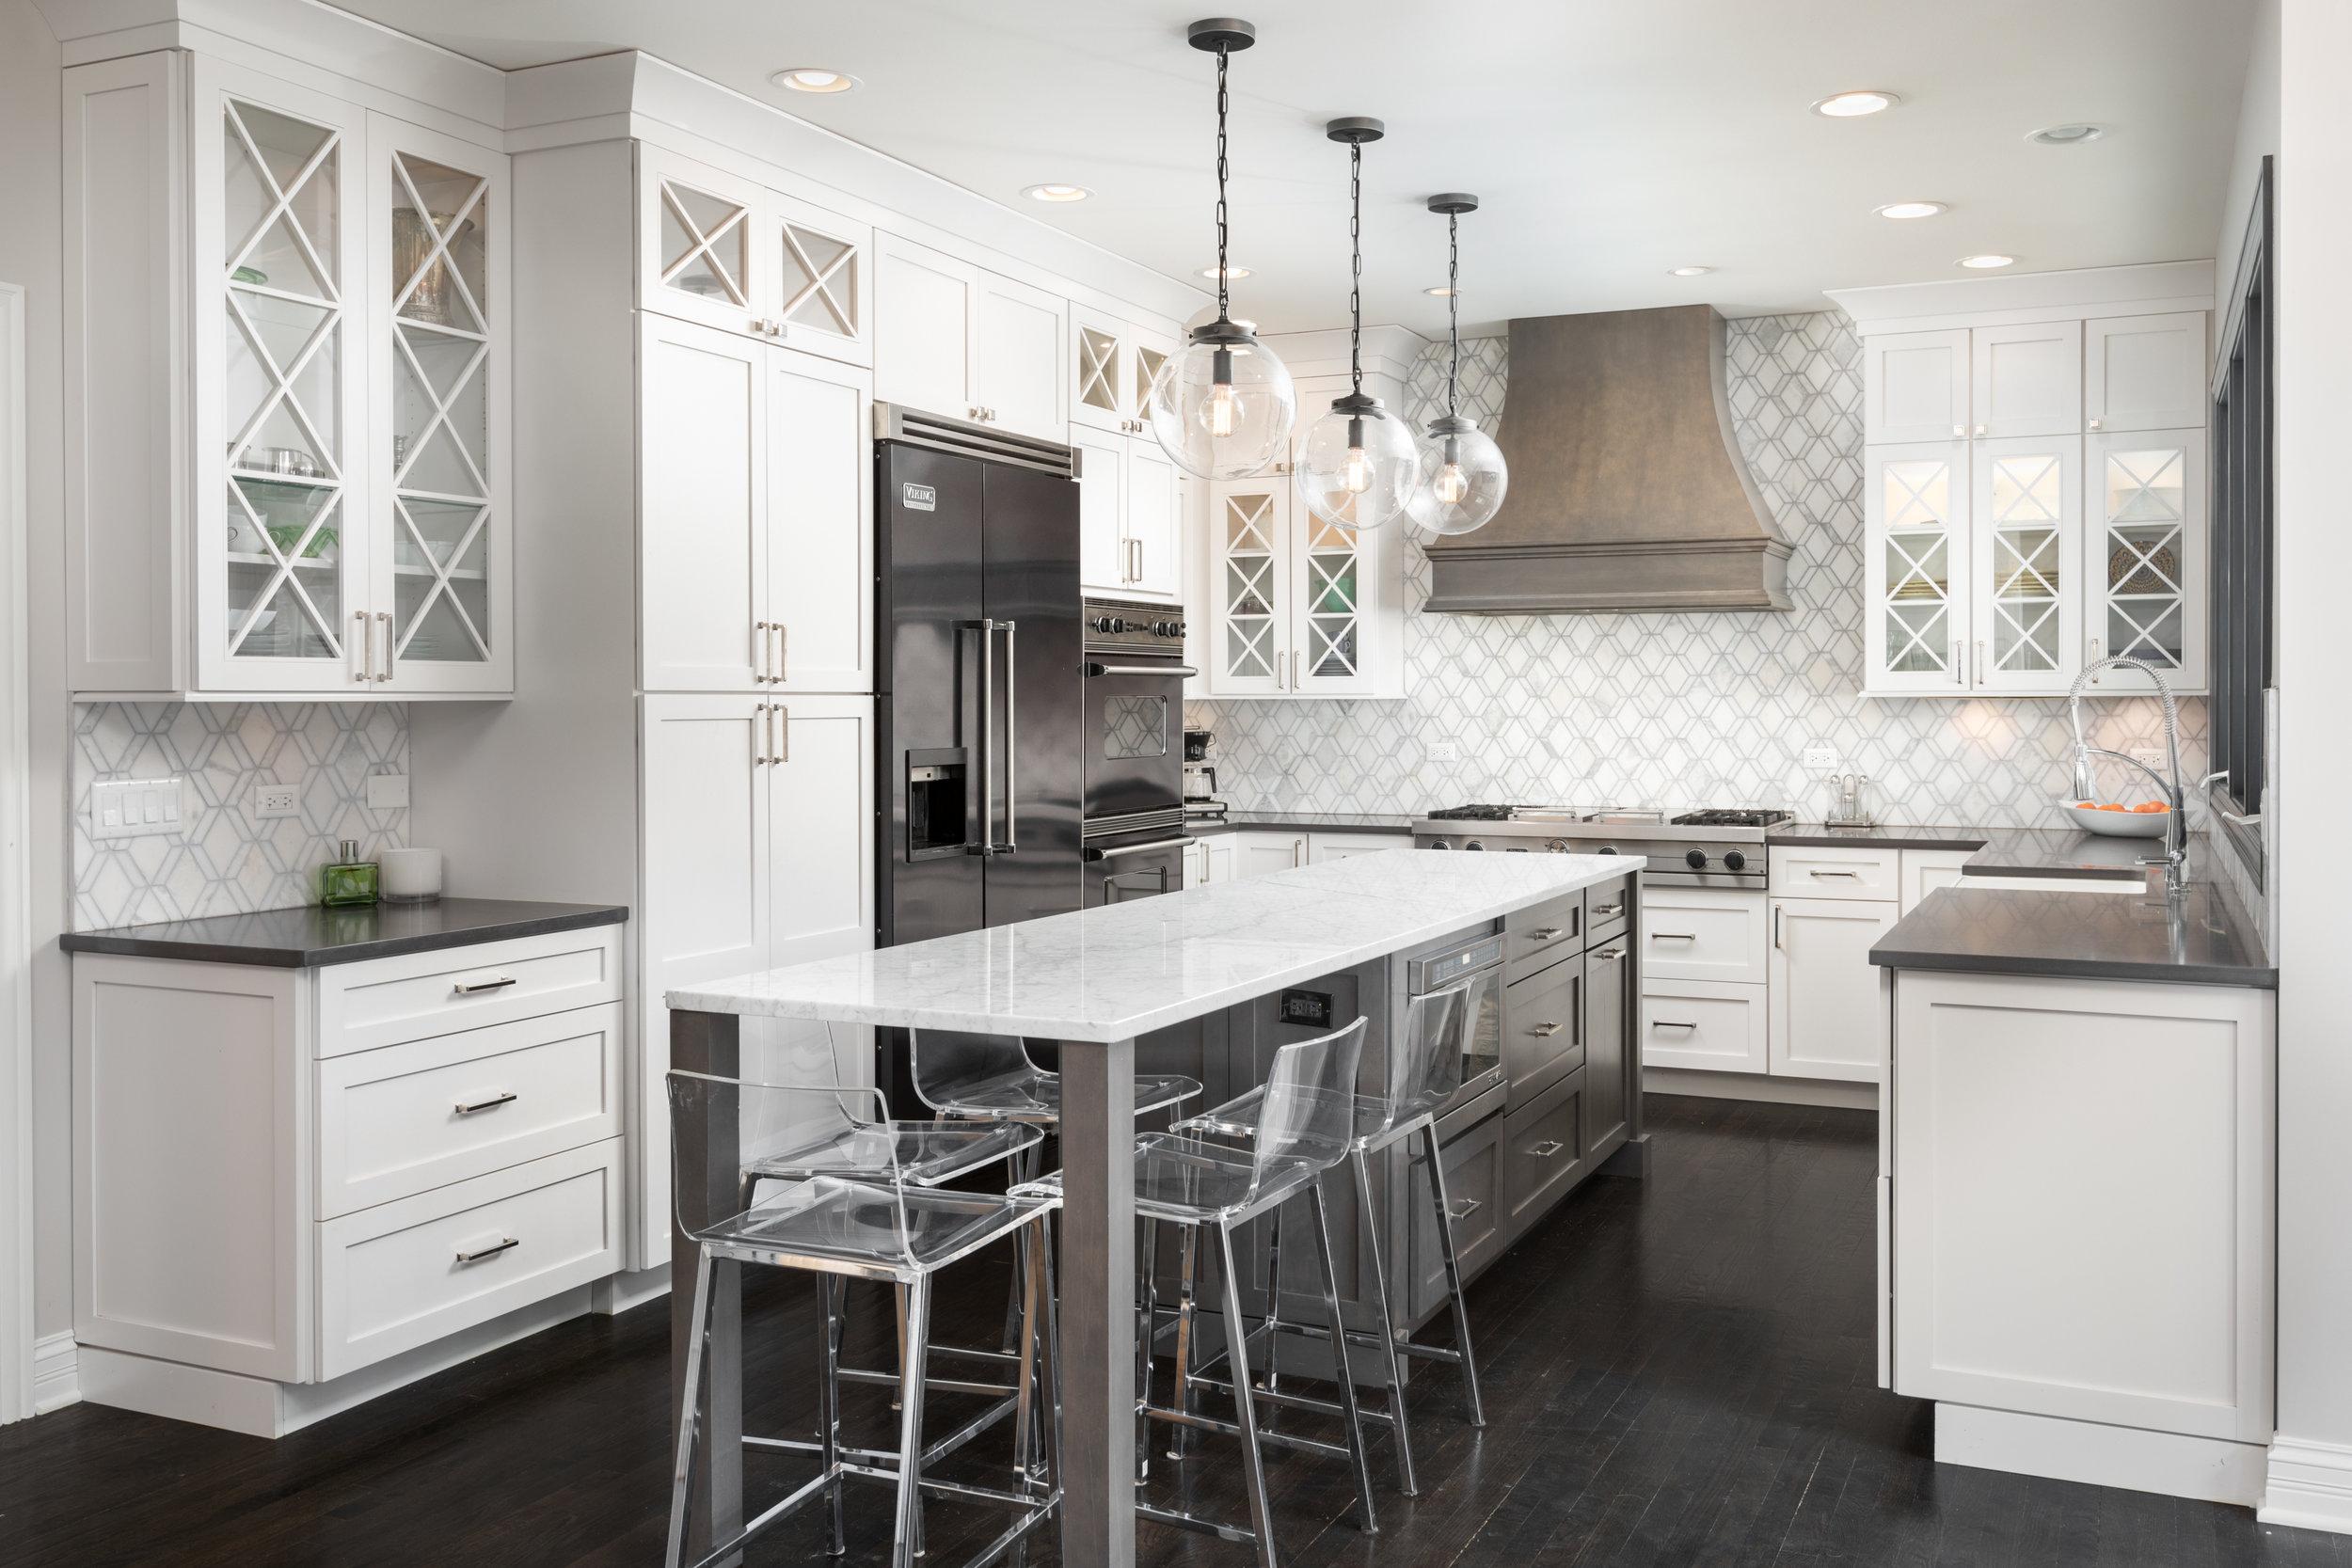 douglas kitchen-2.jpg